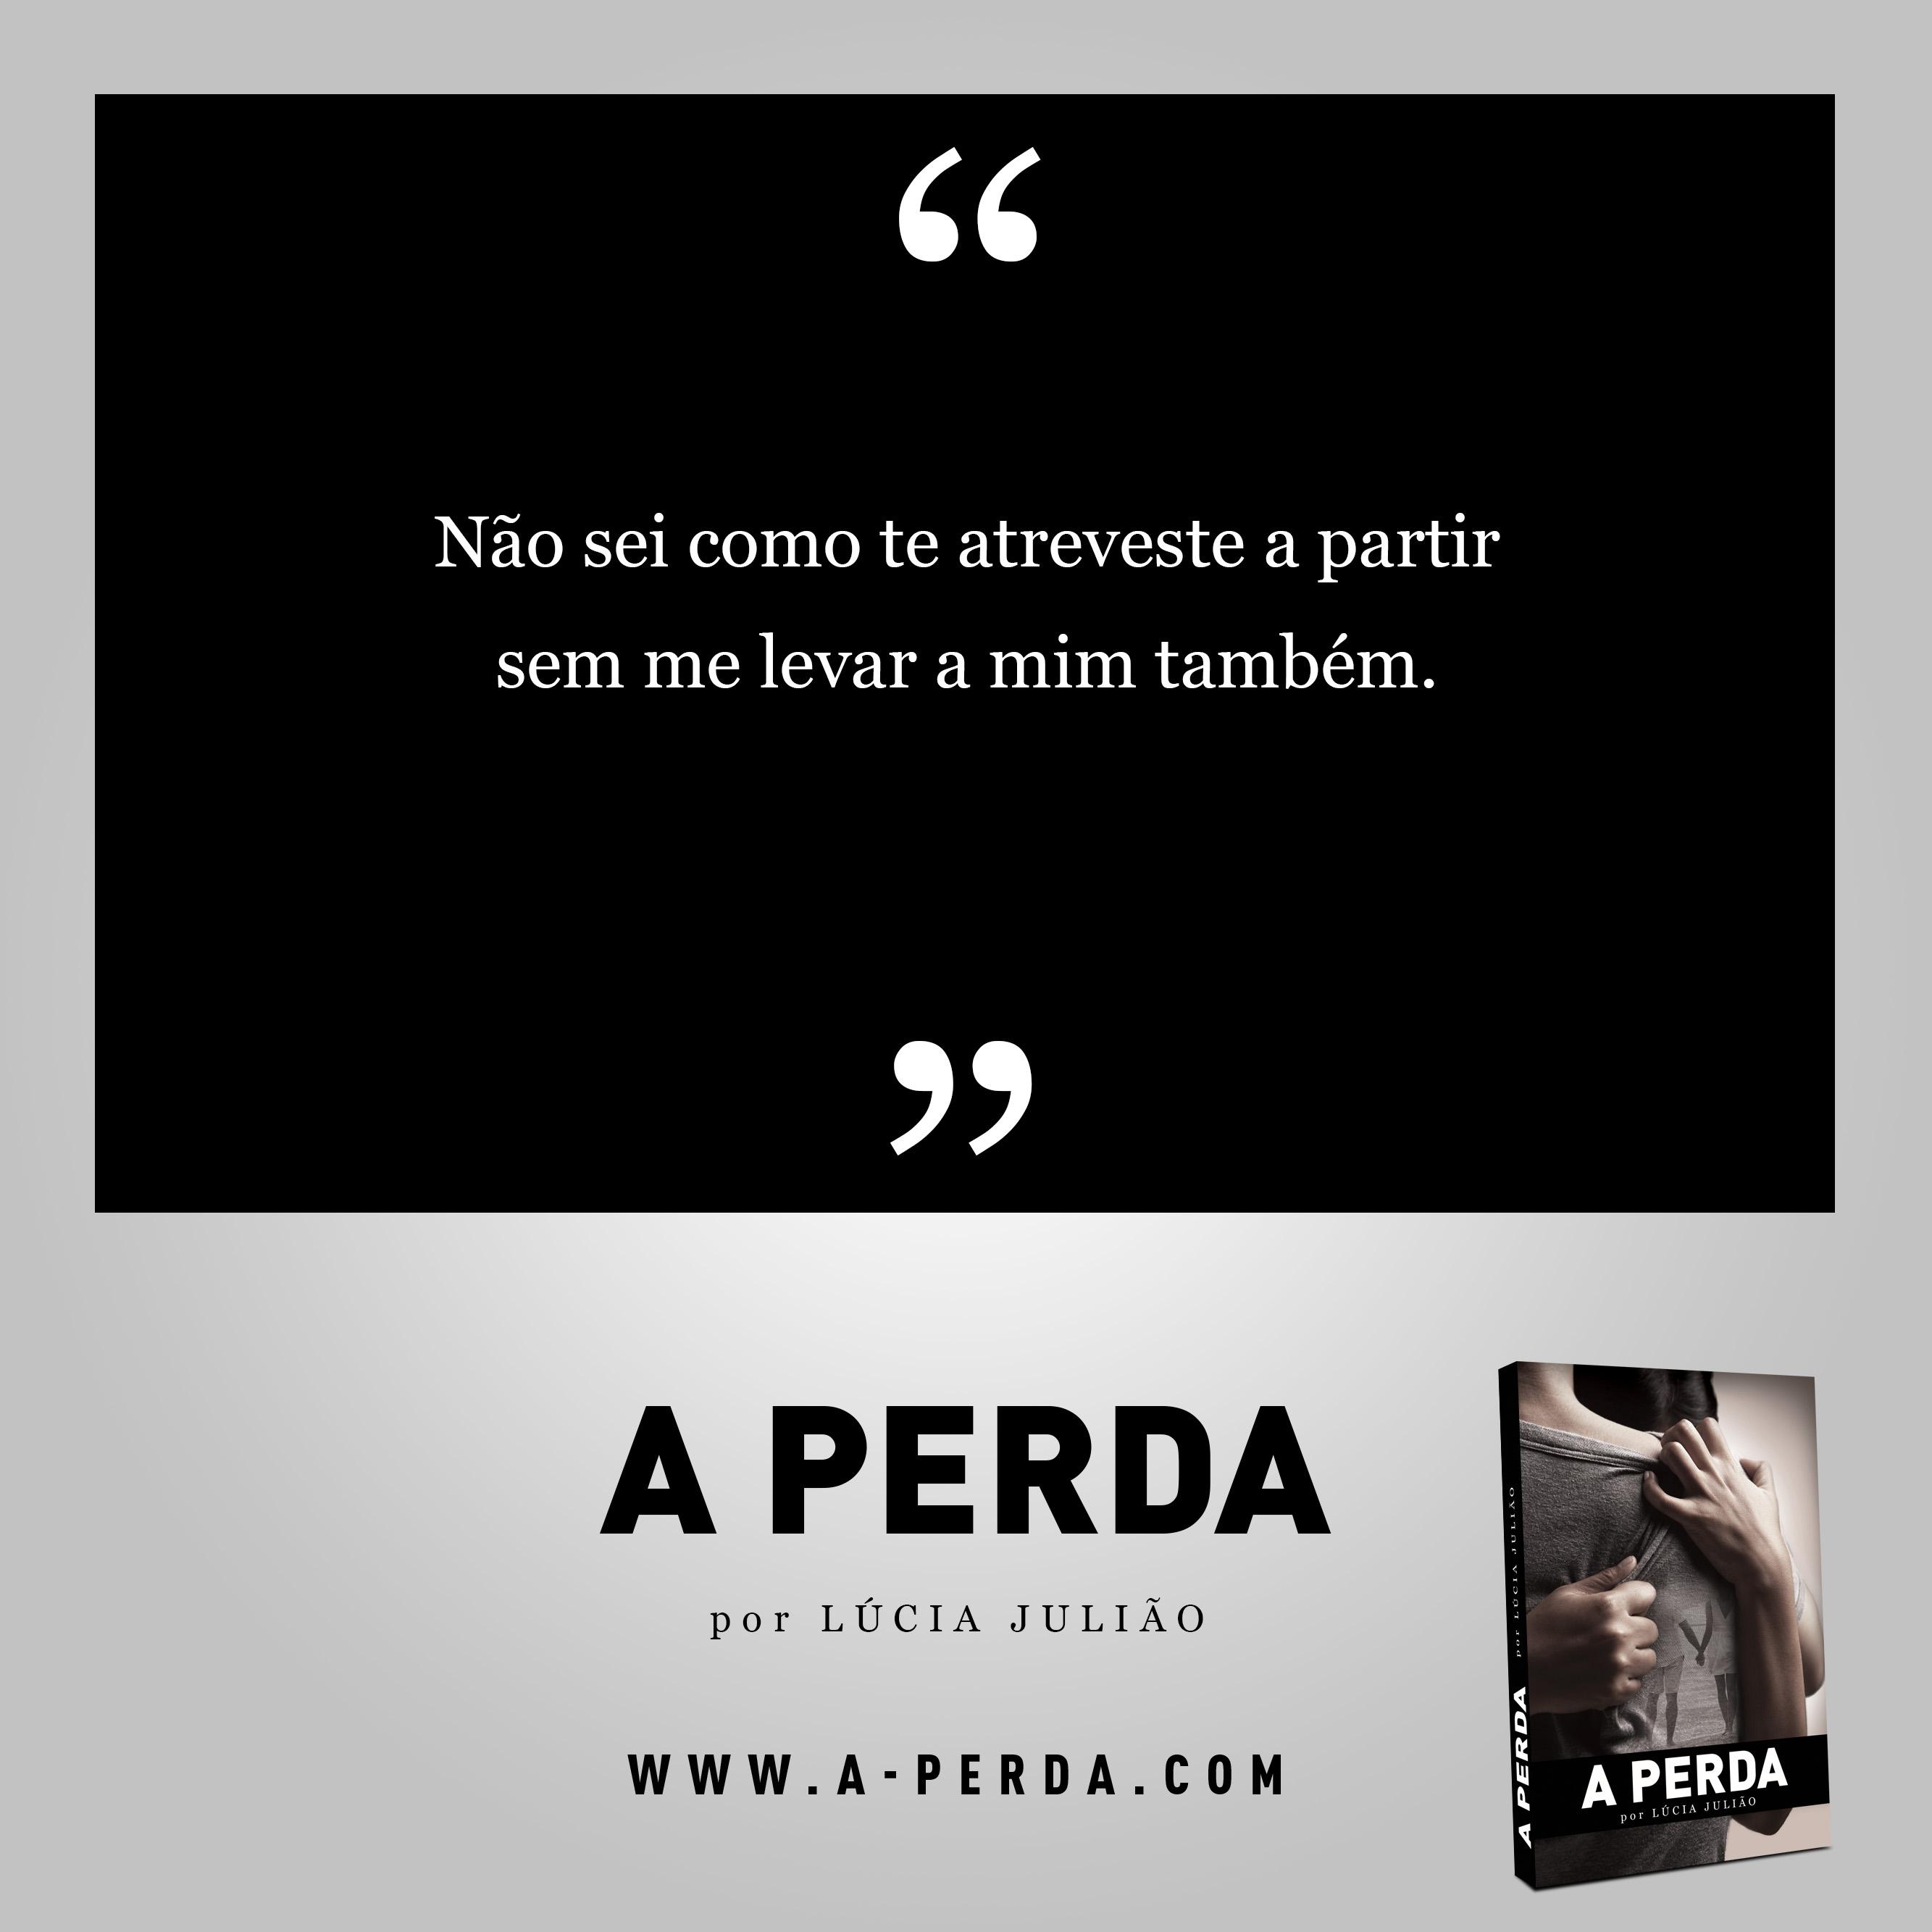 004-capitulo-1-livro-a-Perda-de-Lucia-Juliao-instagram